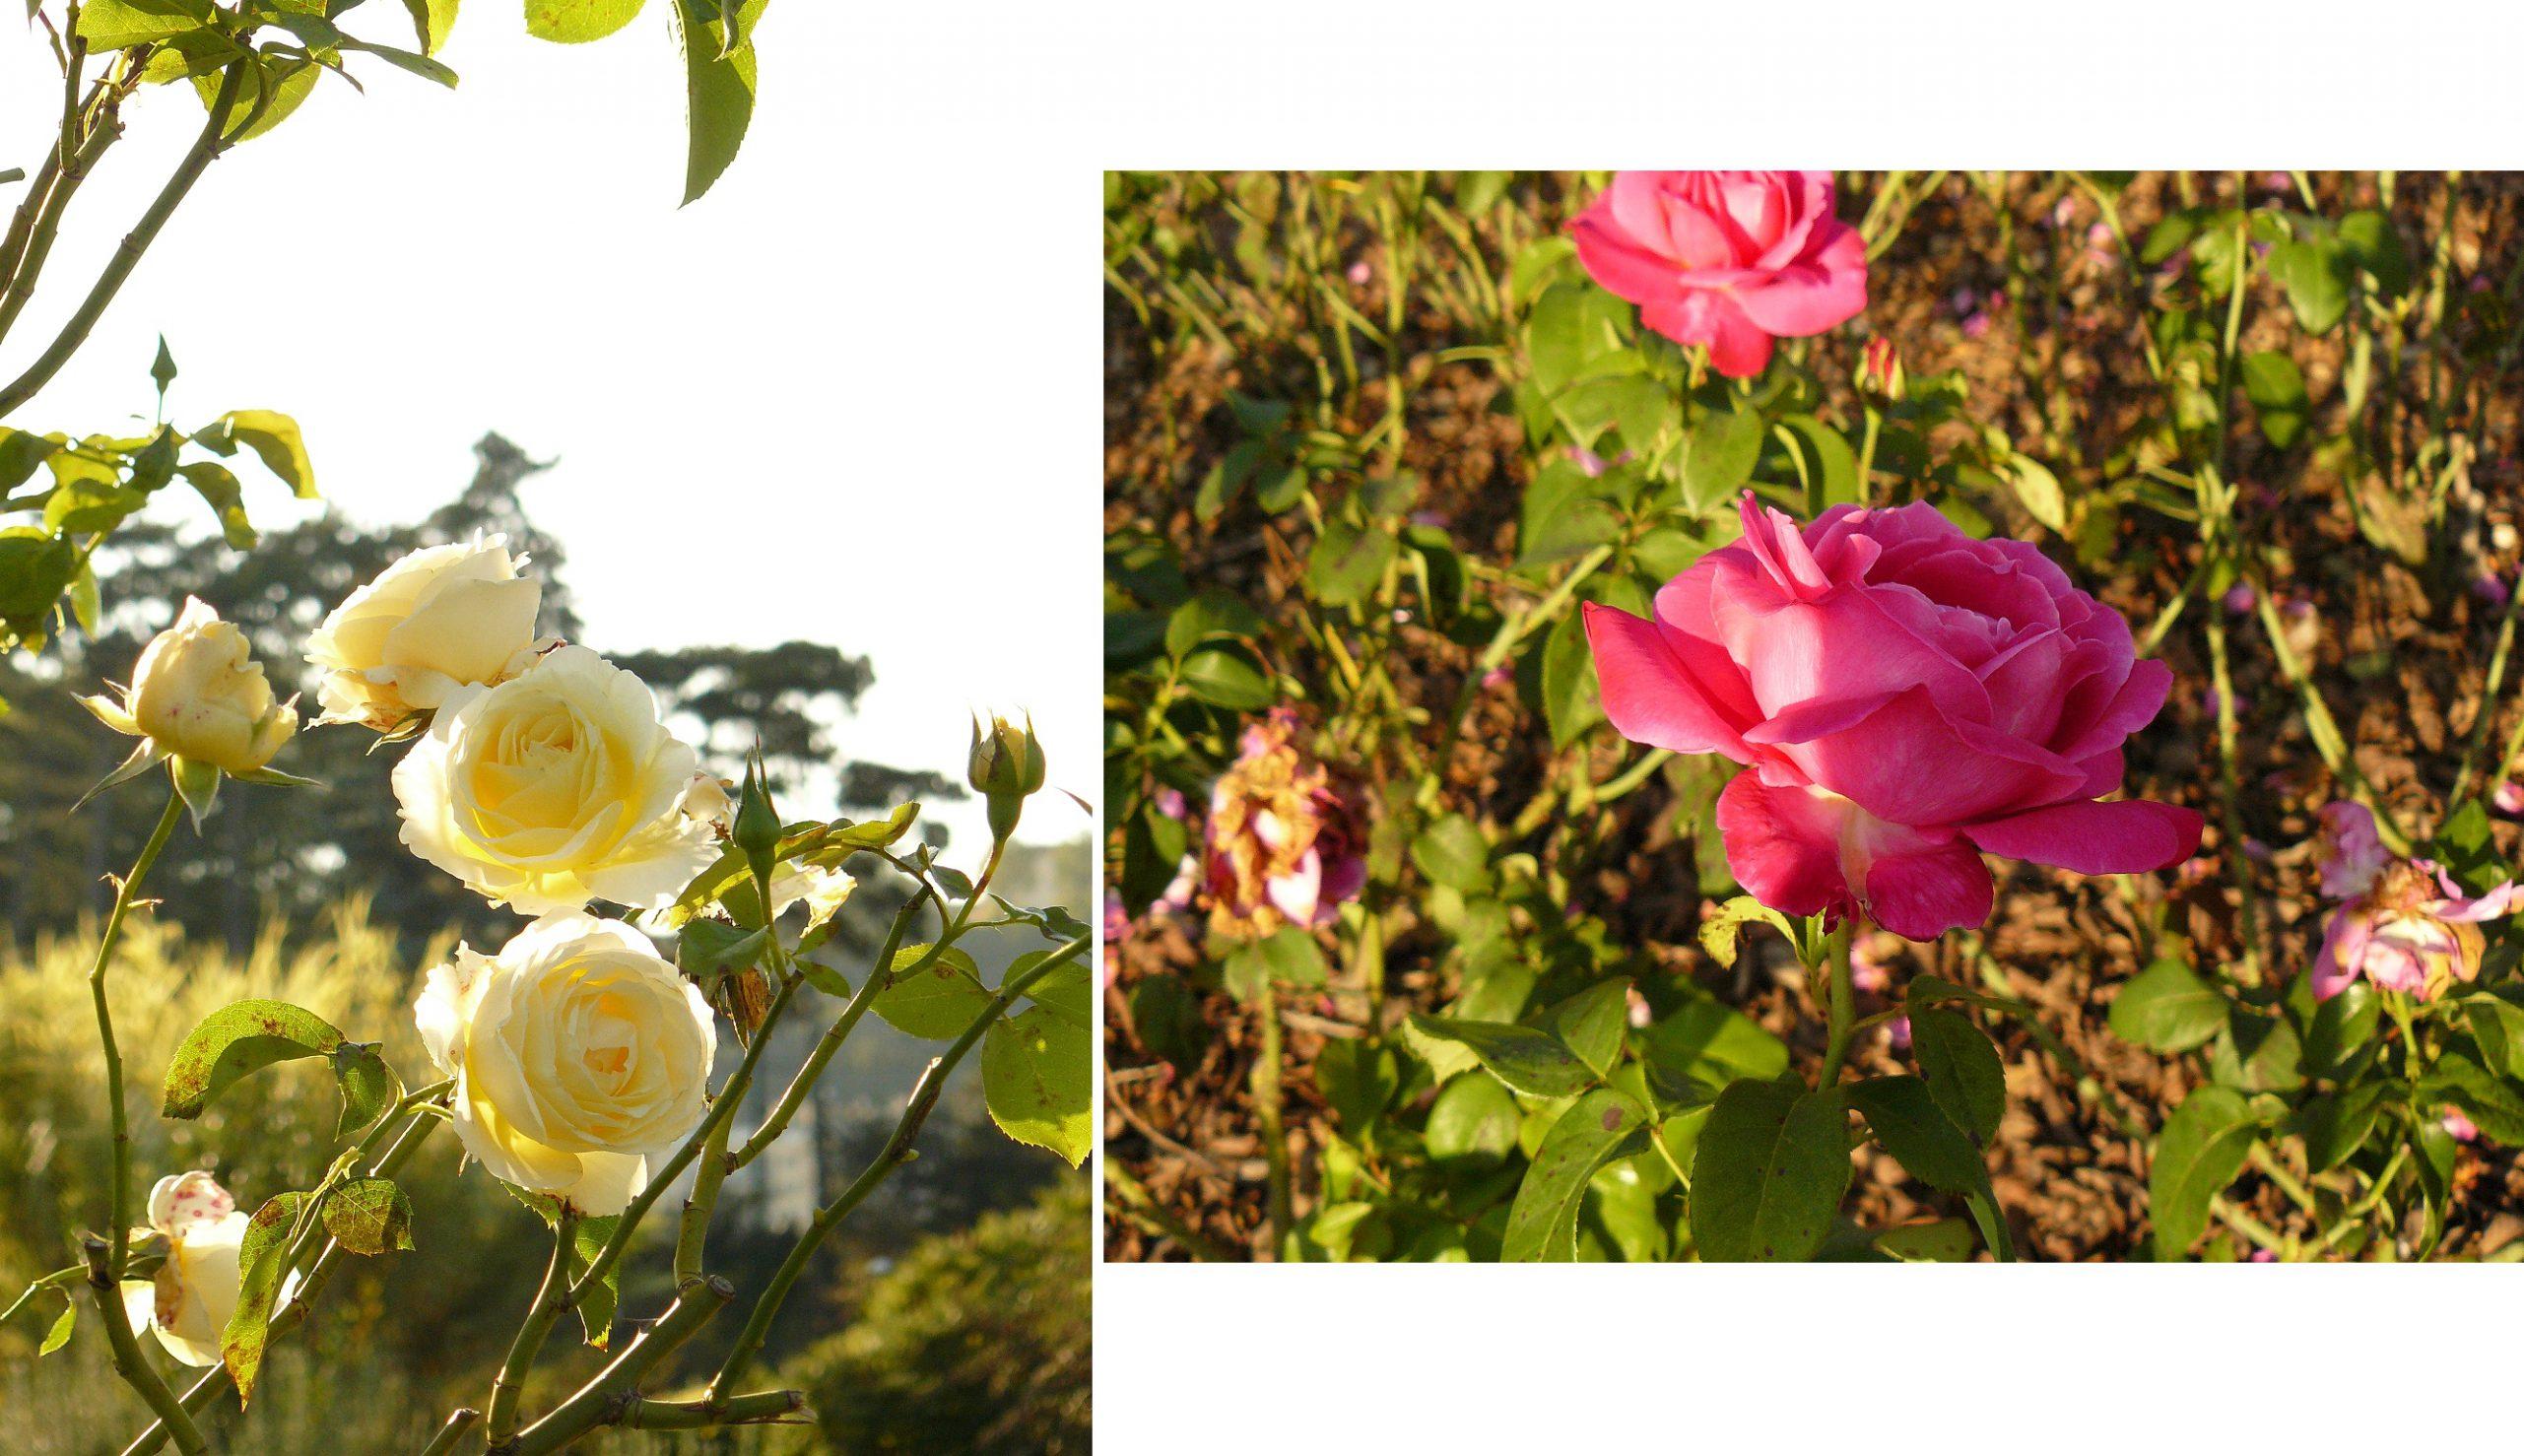 roseraie-lyon-tete-dor